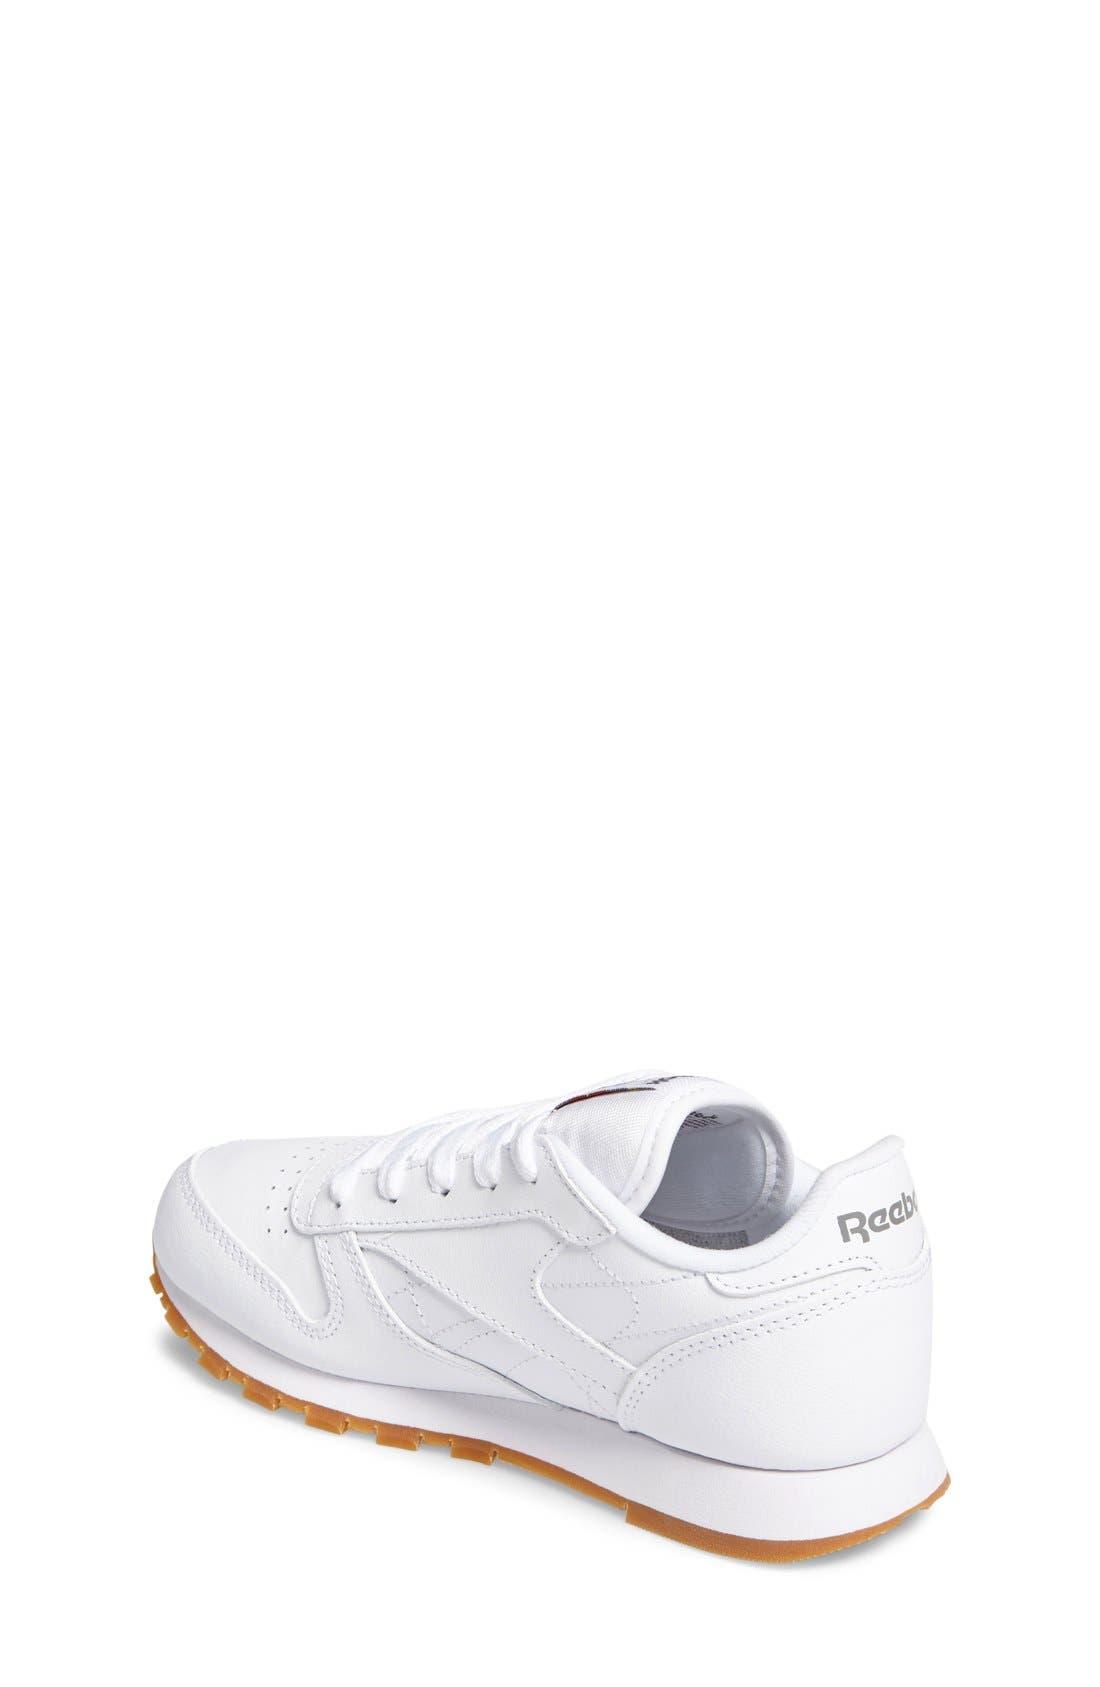 Classic Leather Sneaker,                             Alternate thumbnail 6, color,                             WHITE/ GUM